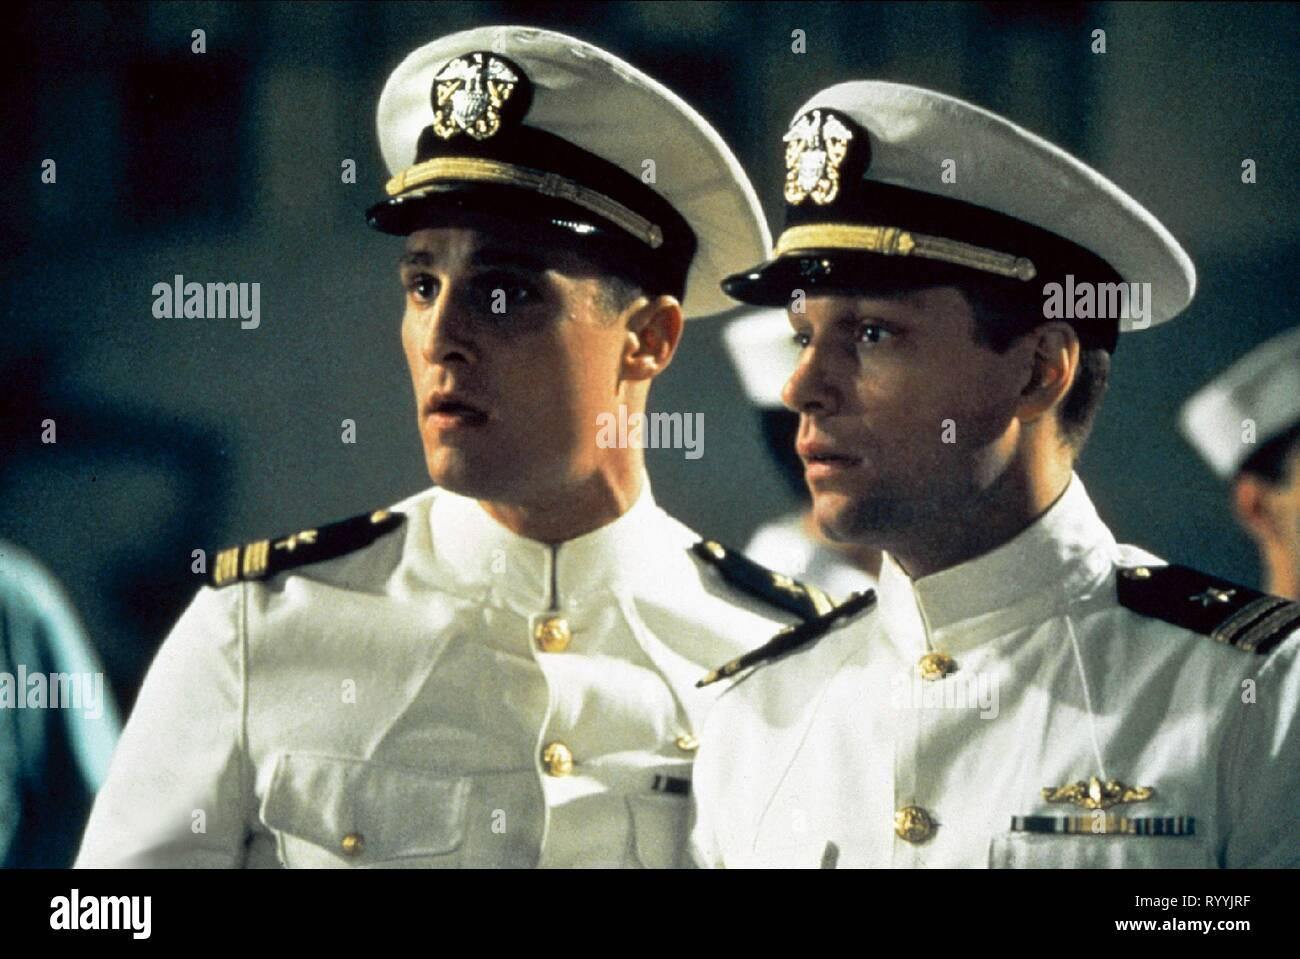 Jon Bon Jovi U 571 Film High Resolution Stock Photography and Images - Alamy